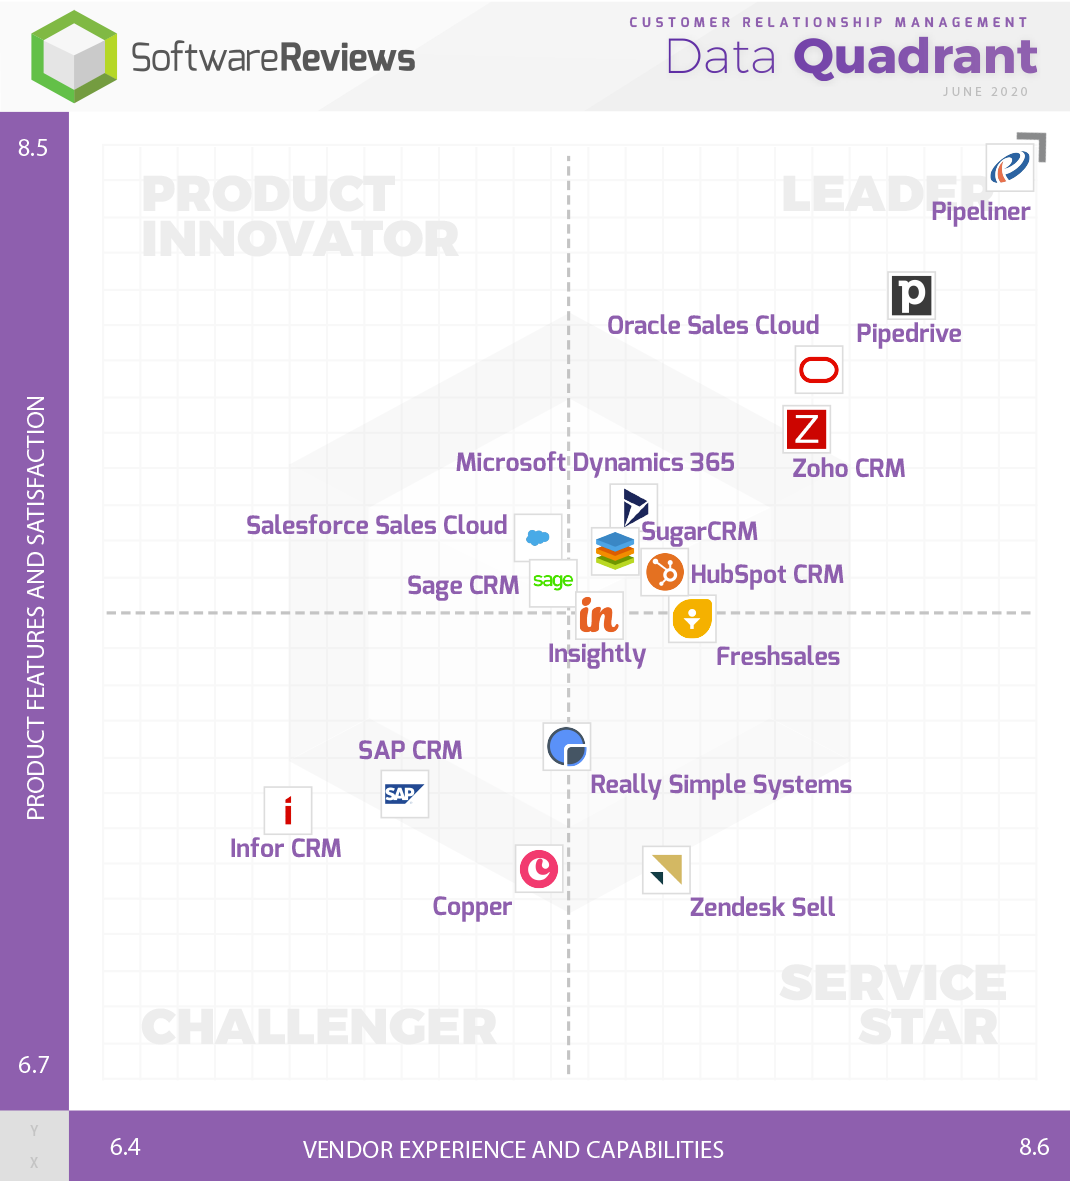 Customer Relationship Management Data Quadrant